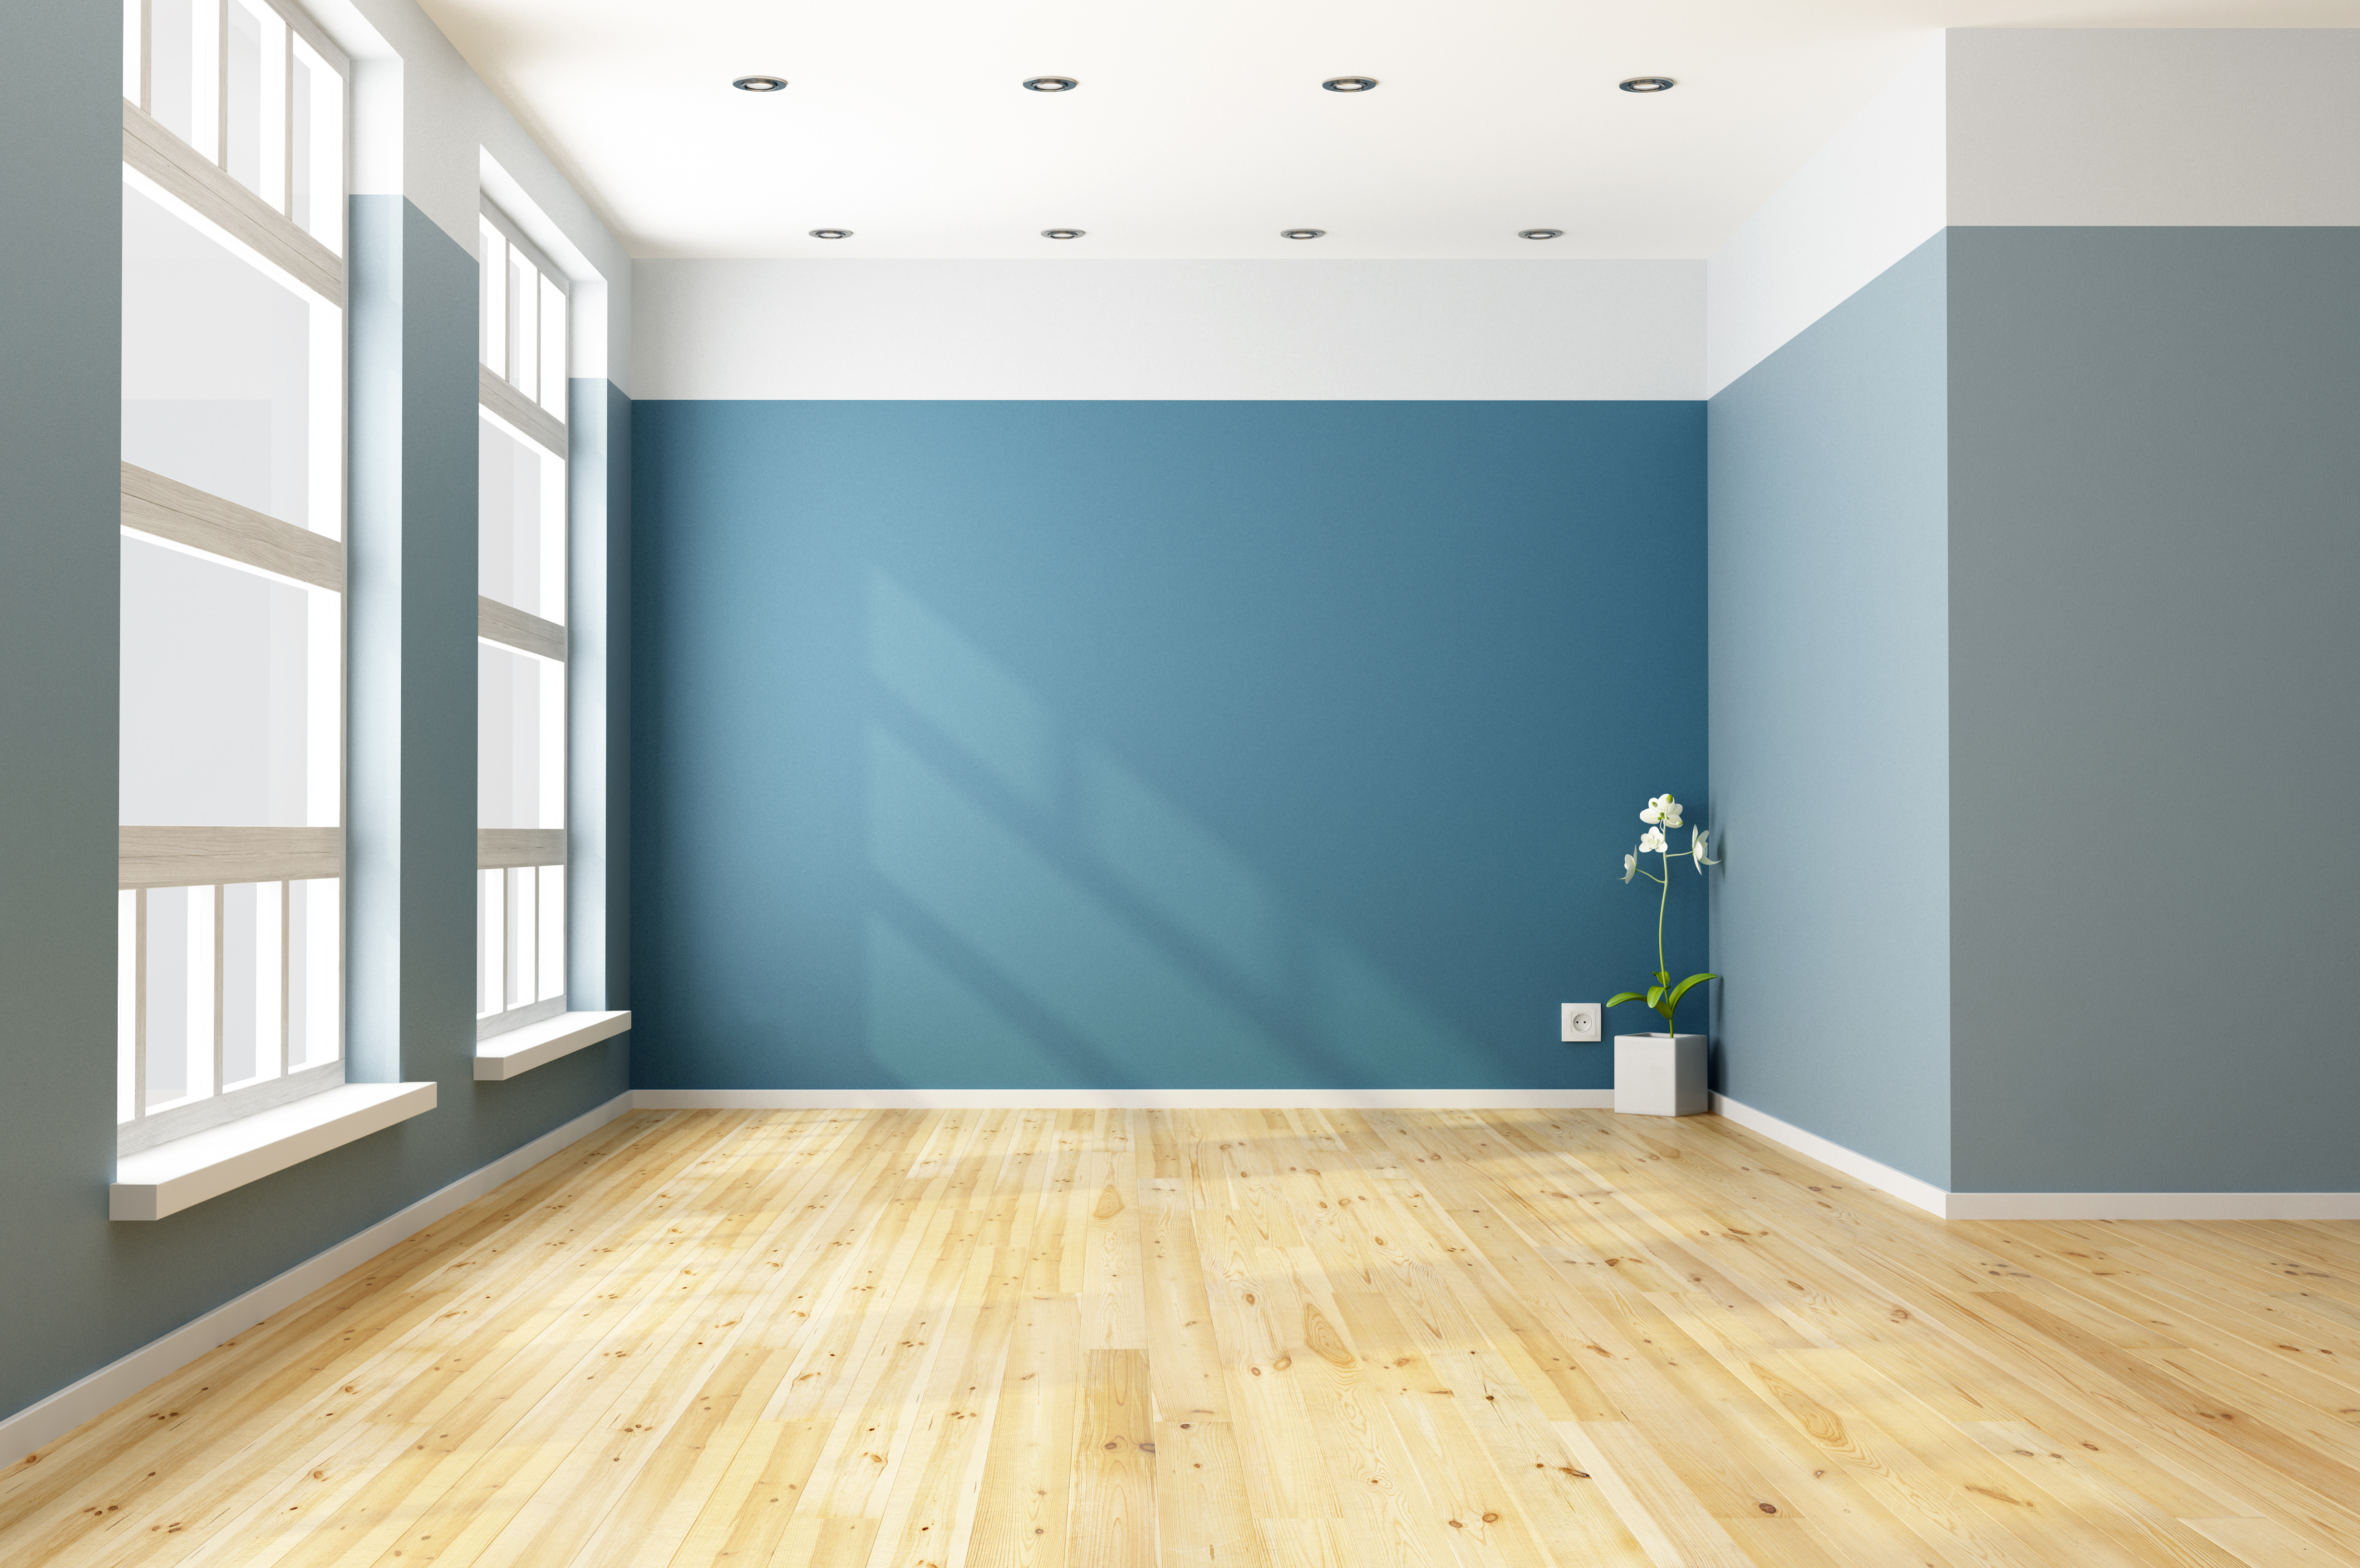 Arredamento casa mobili design bolzano arredobene for Mobili bolzano